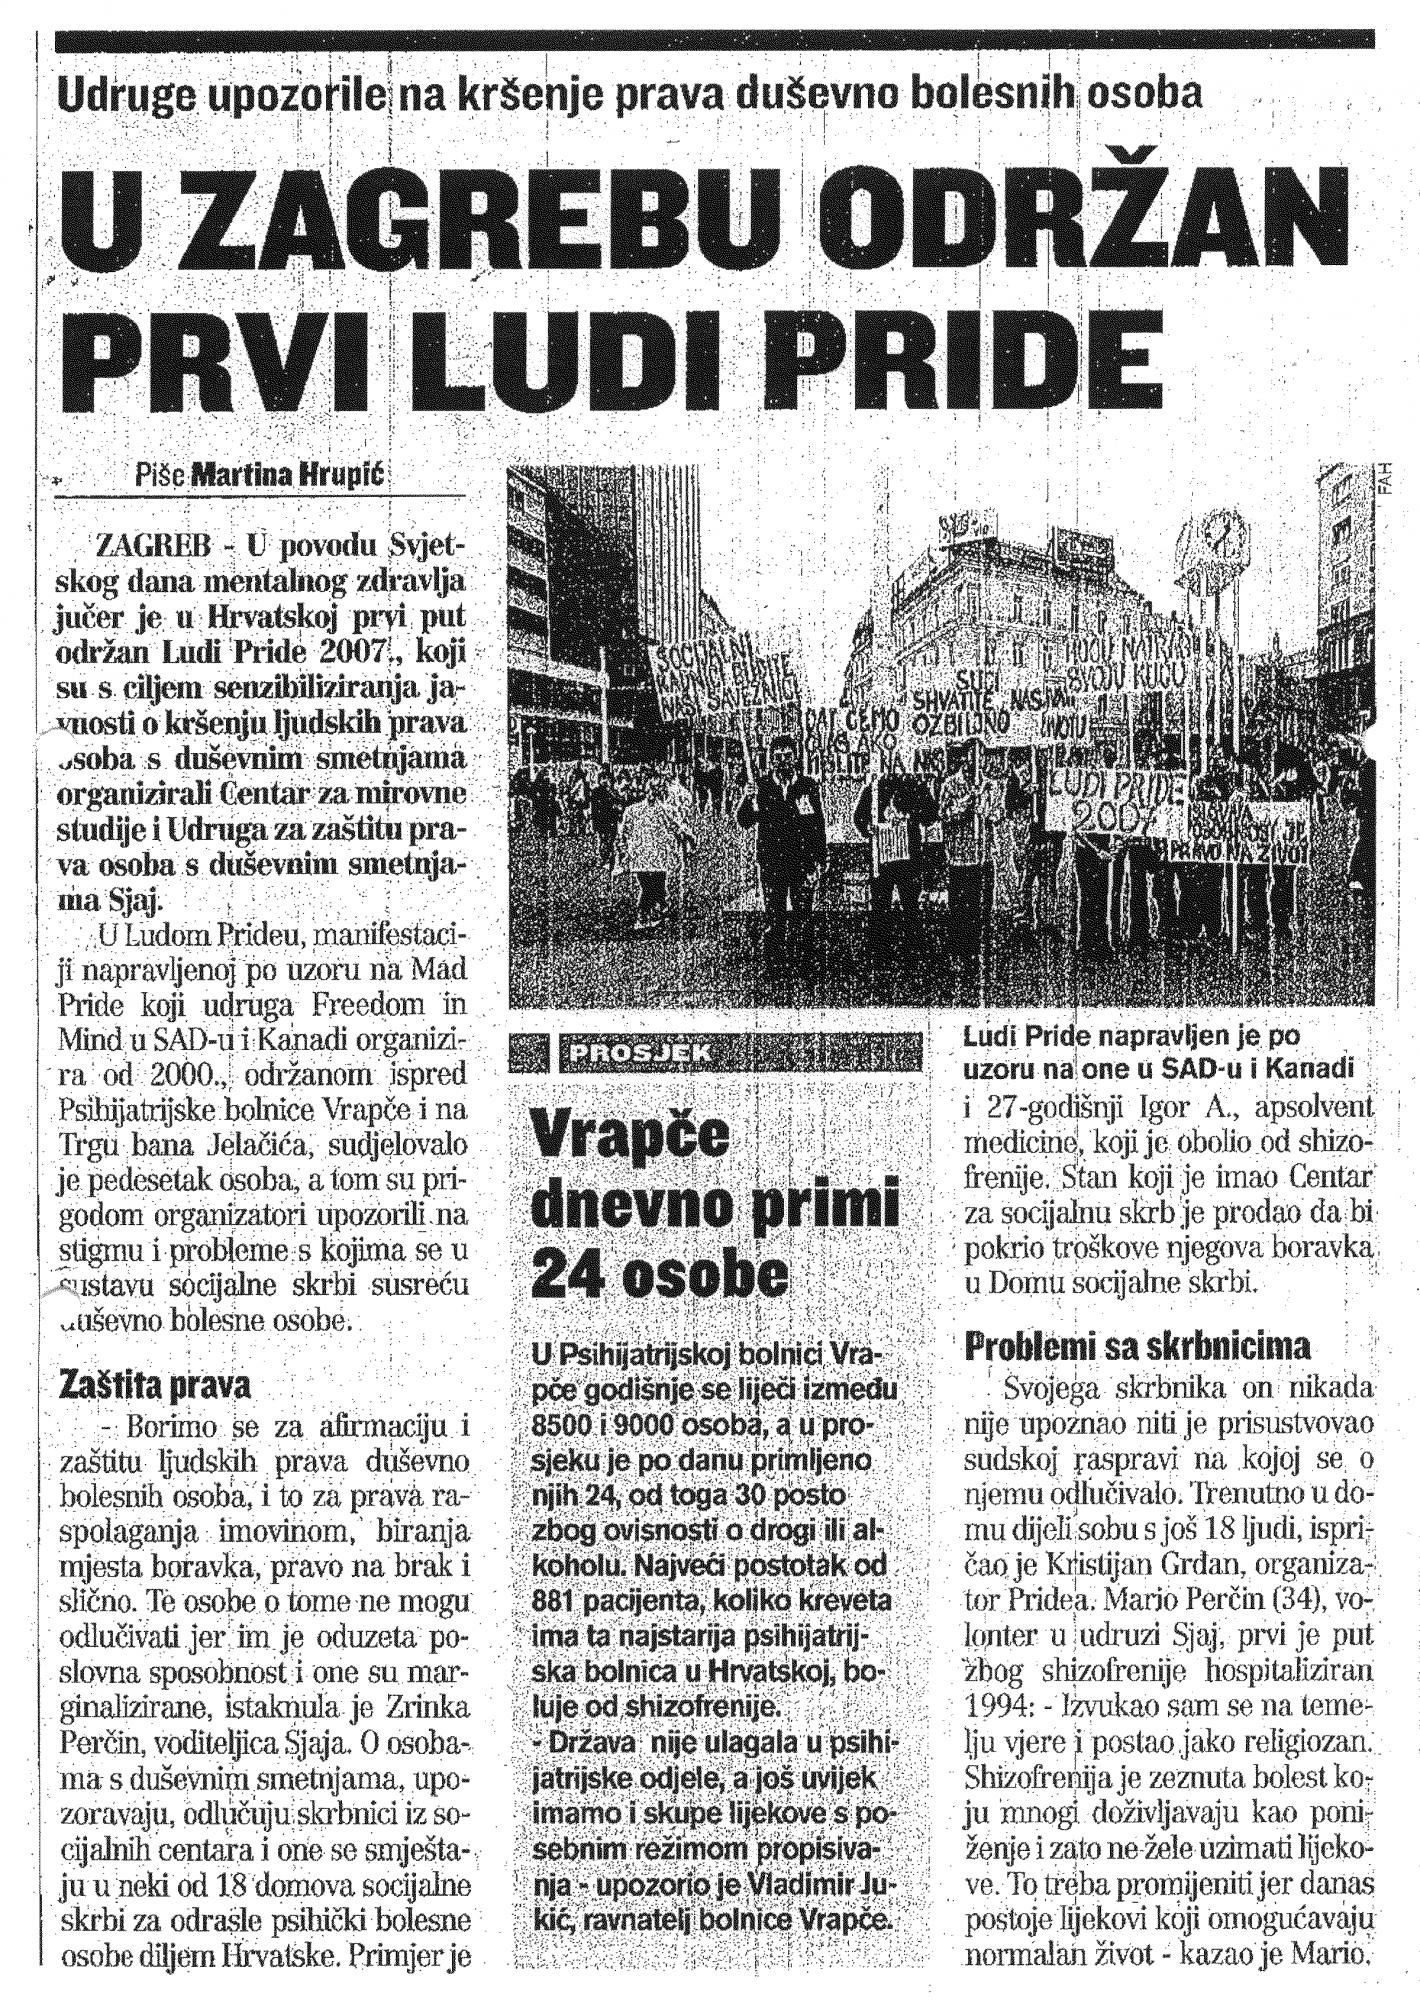 2007 LUDI PRIDE - NOVINE 2